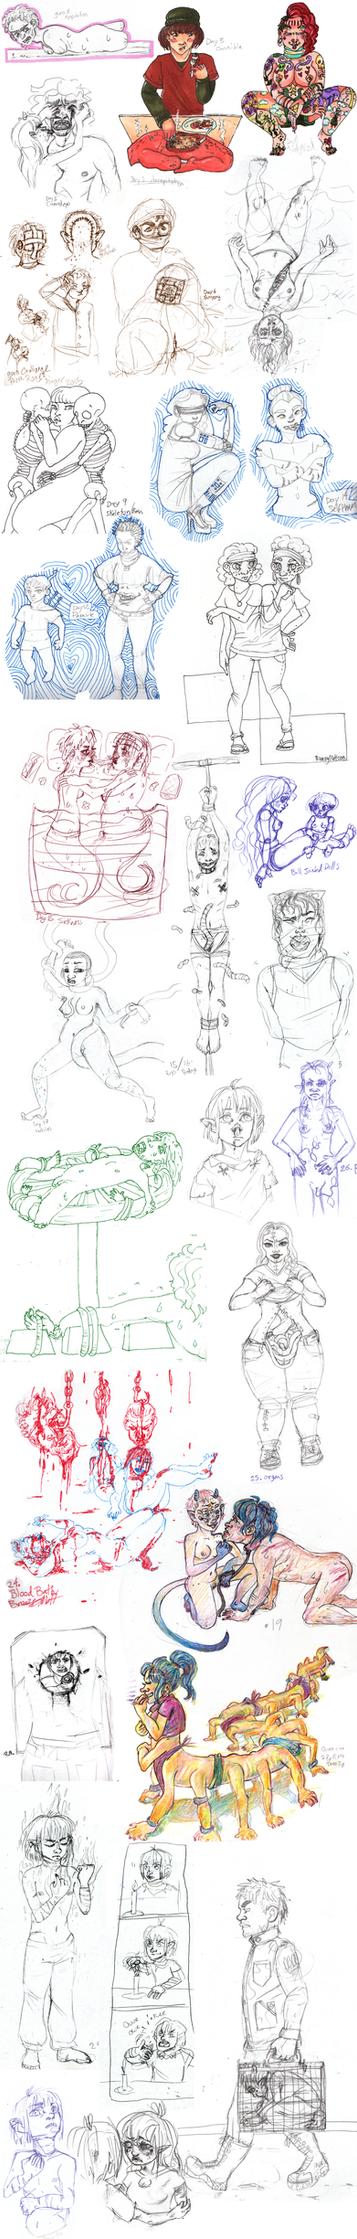 33 day guro challenge sketchdump by MottInThePot